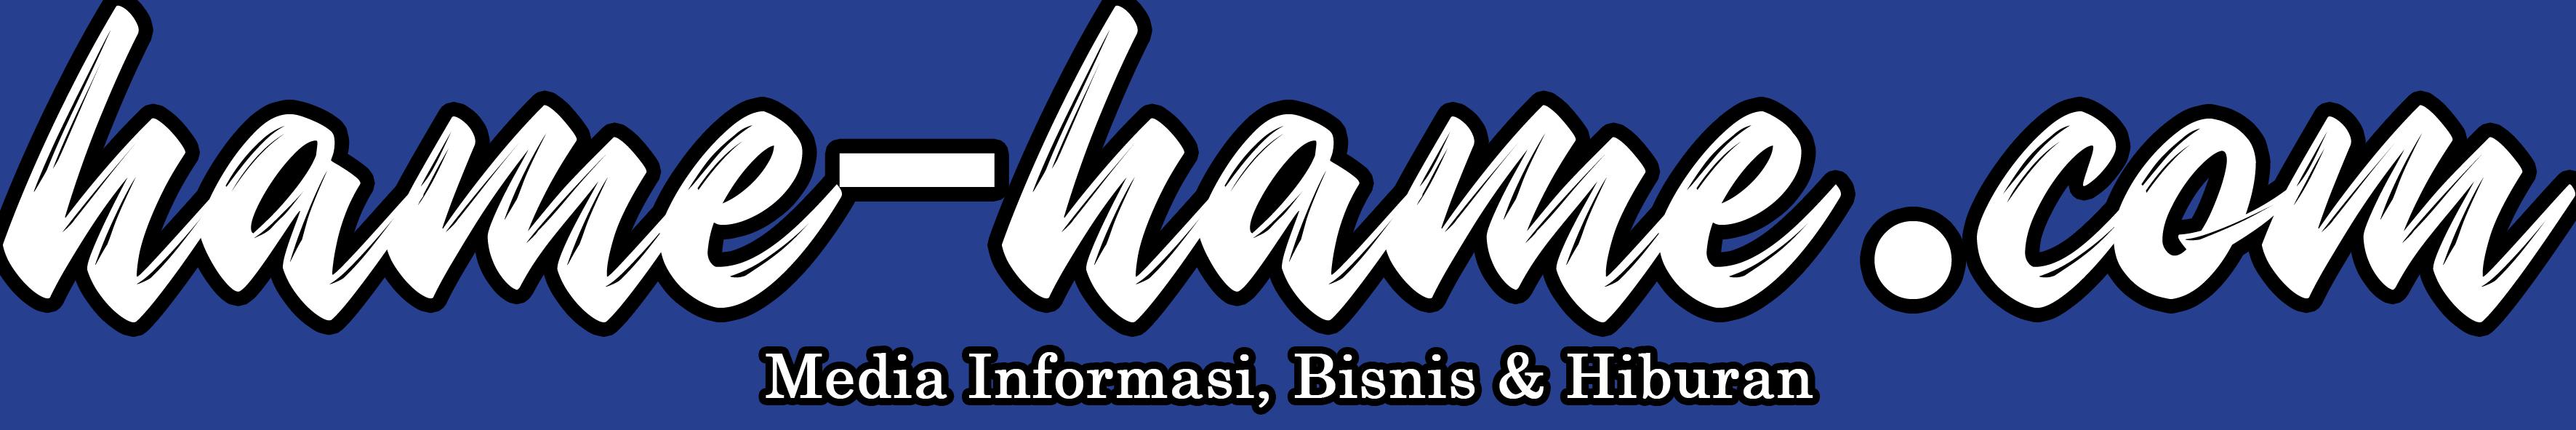 hame-hame.com